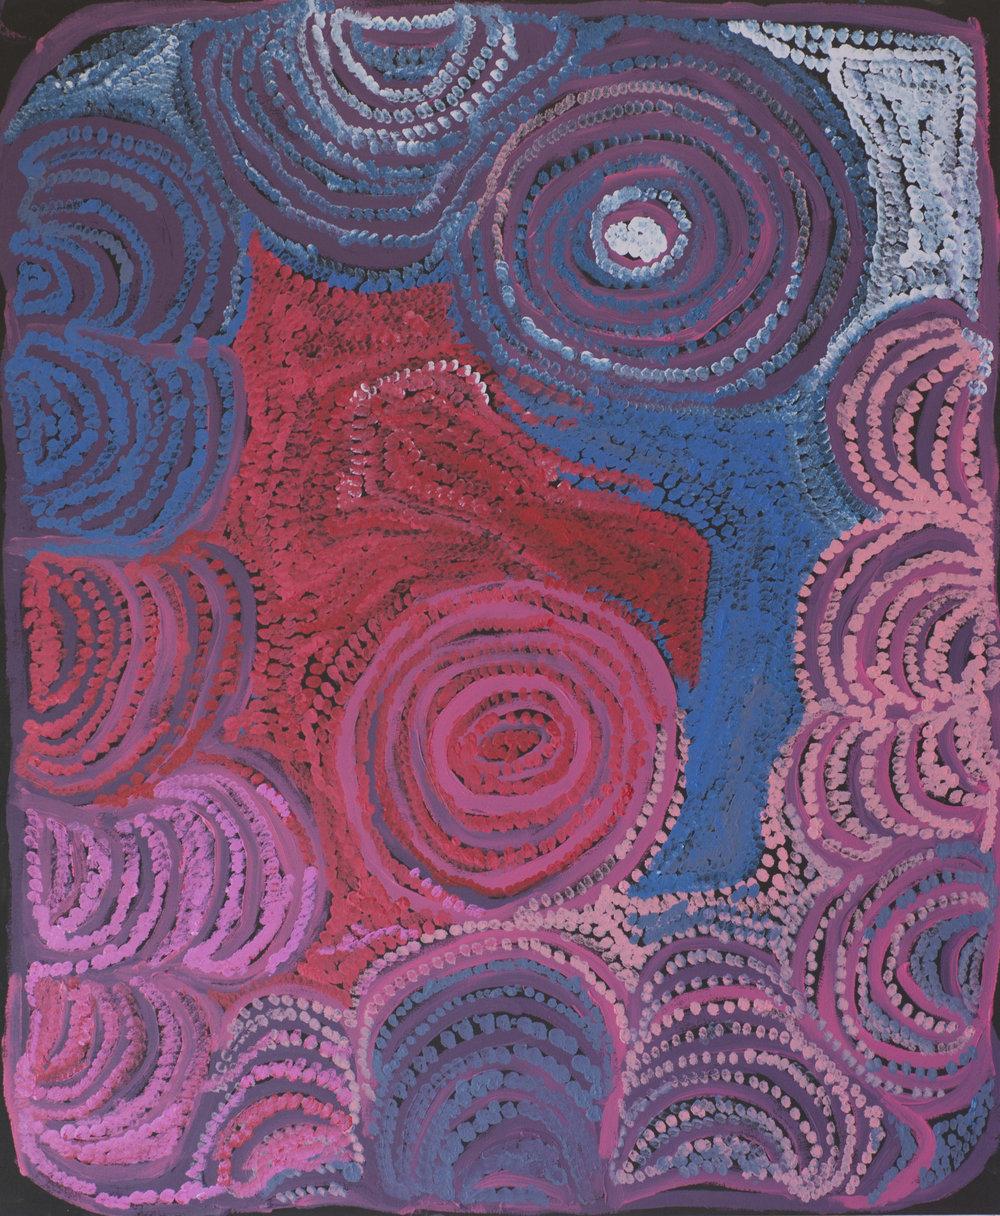 "NYARAPAYI GILES  Warmurrungu  39"" x 47"" (121 x 101.5 cm) Acrylic on Belgian linen Tjarlirli Artists catalog #15-586   EMAIL INQUIRY"